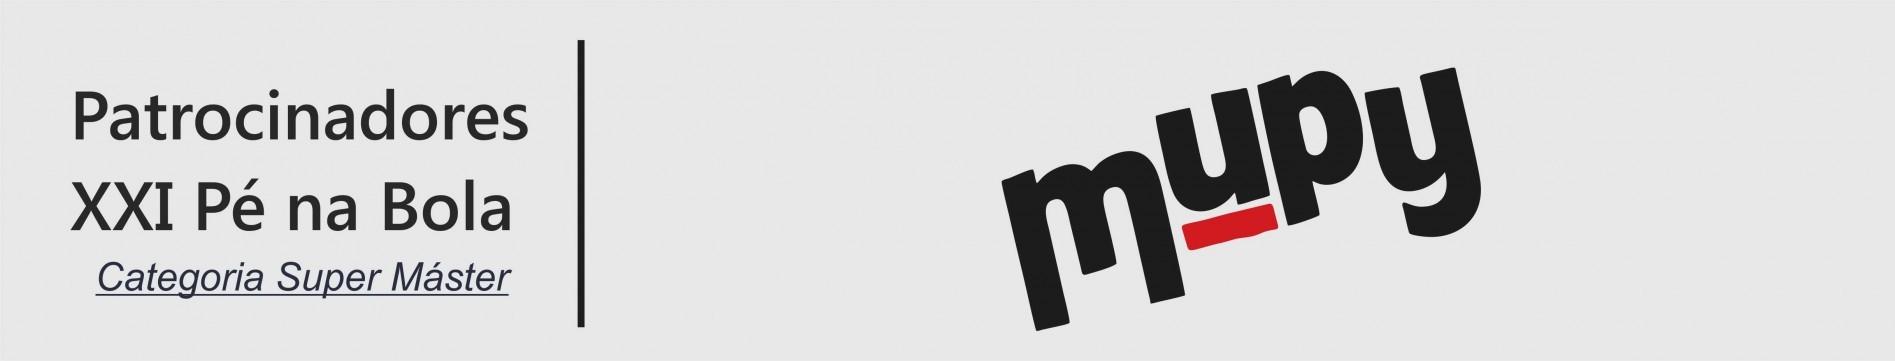 uploads/multimidia/20180627062400-mupy.jpg